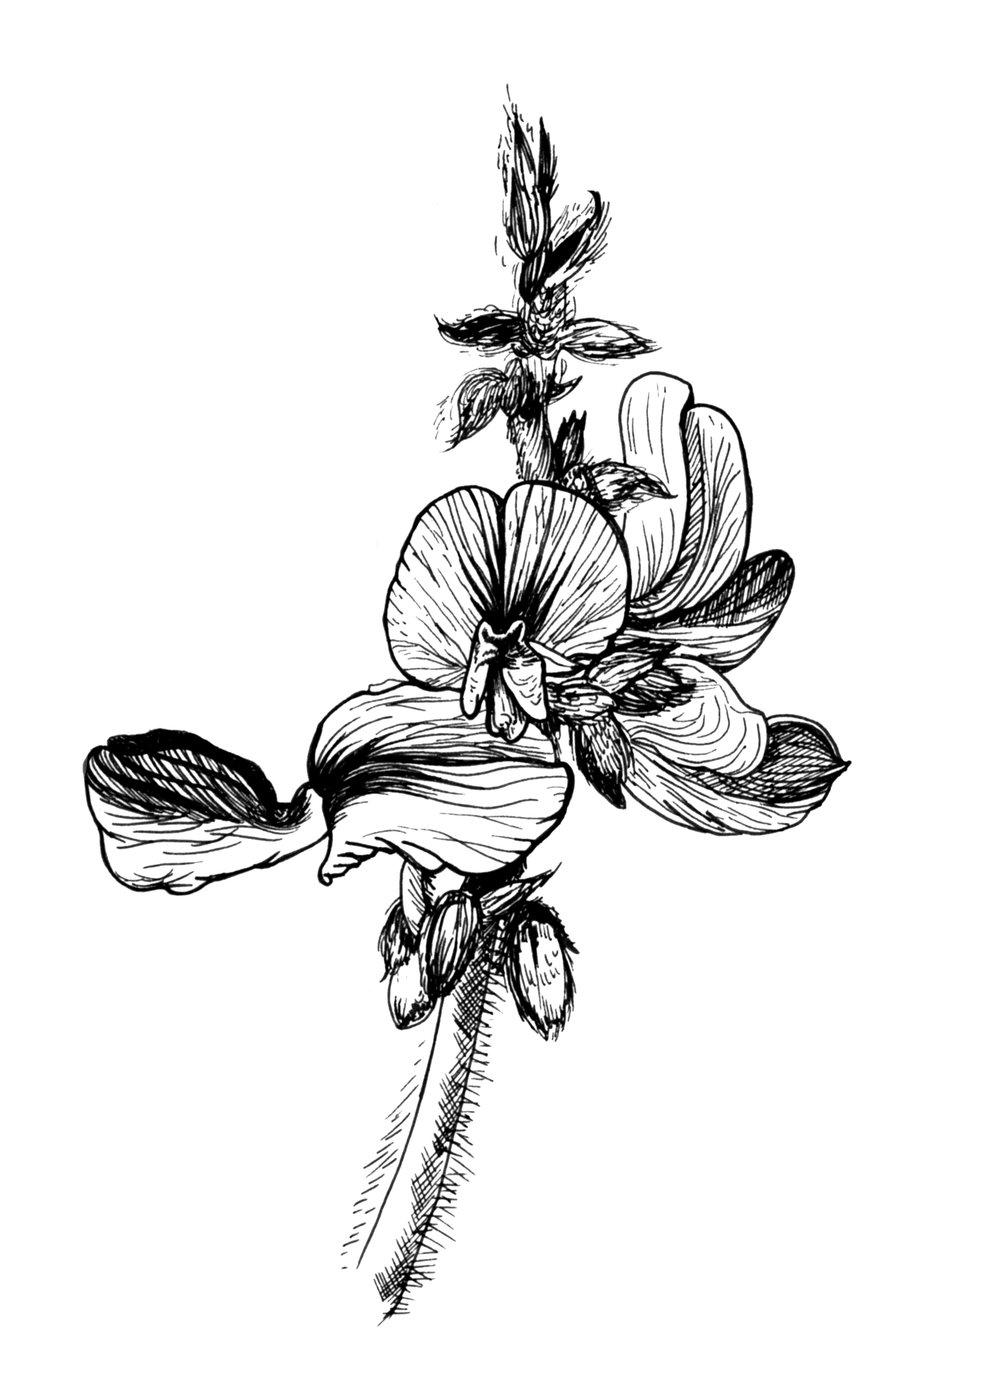 Orchid_CostaRica_Jan20_2017 copy.jpg